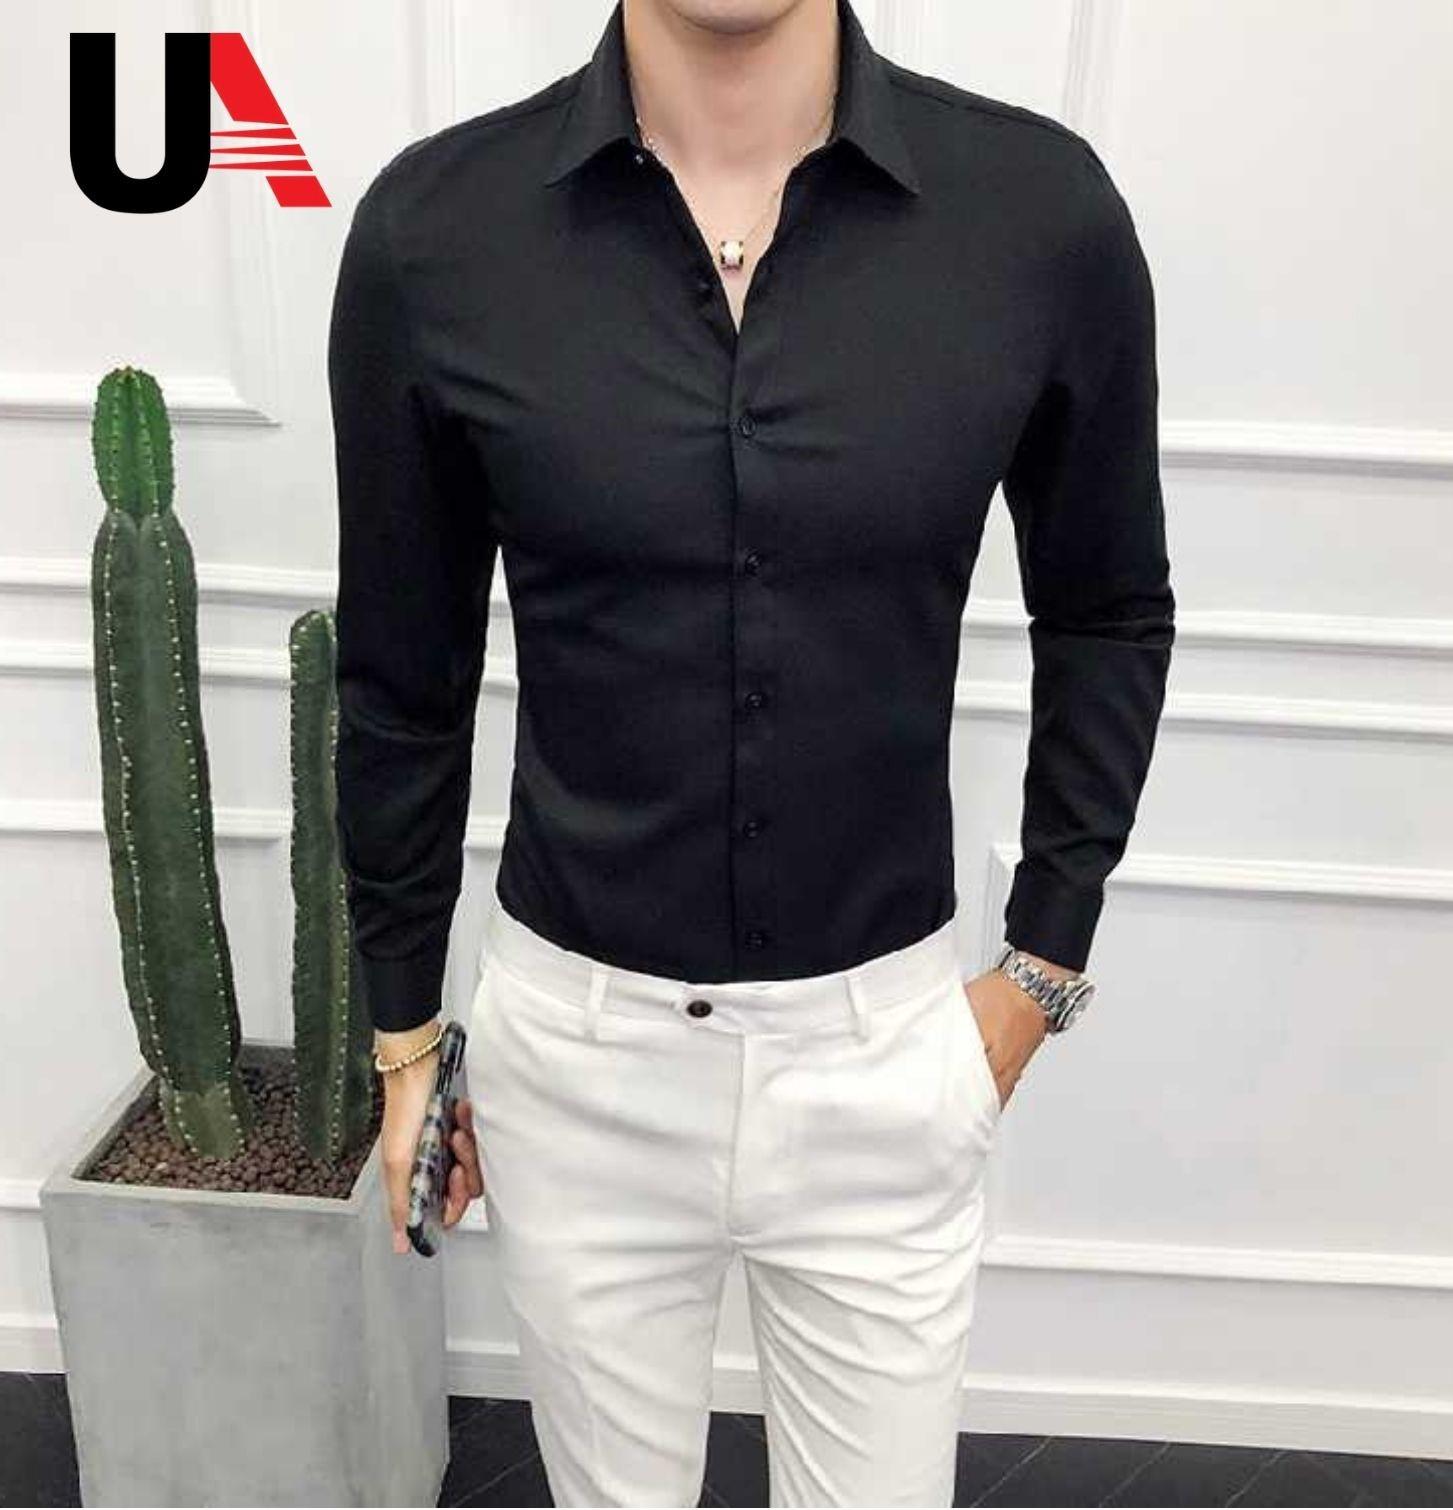 Men's Long Sleeve Black Office Dress Shirt 100% Cotton - Buy Cotton/cashmere Shirt,Men Office Long Sleeve Shirt,Cheap Long Sleeve Dress Shirts Product ...